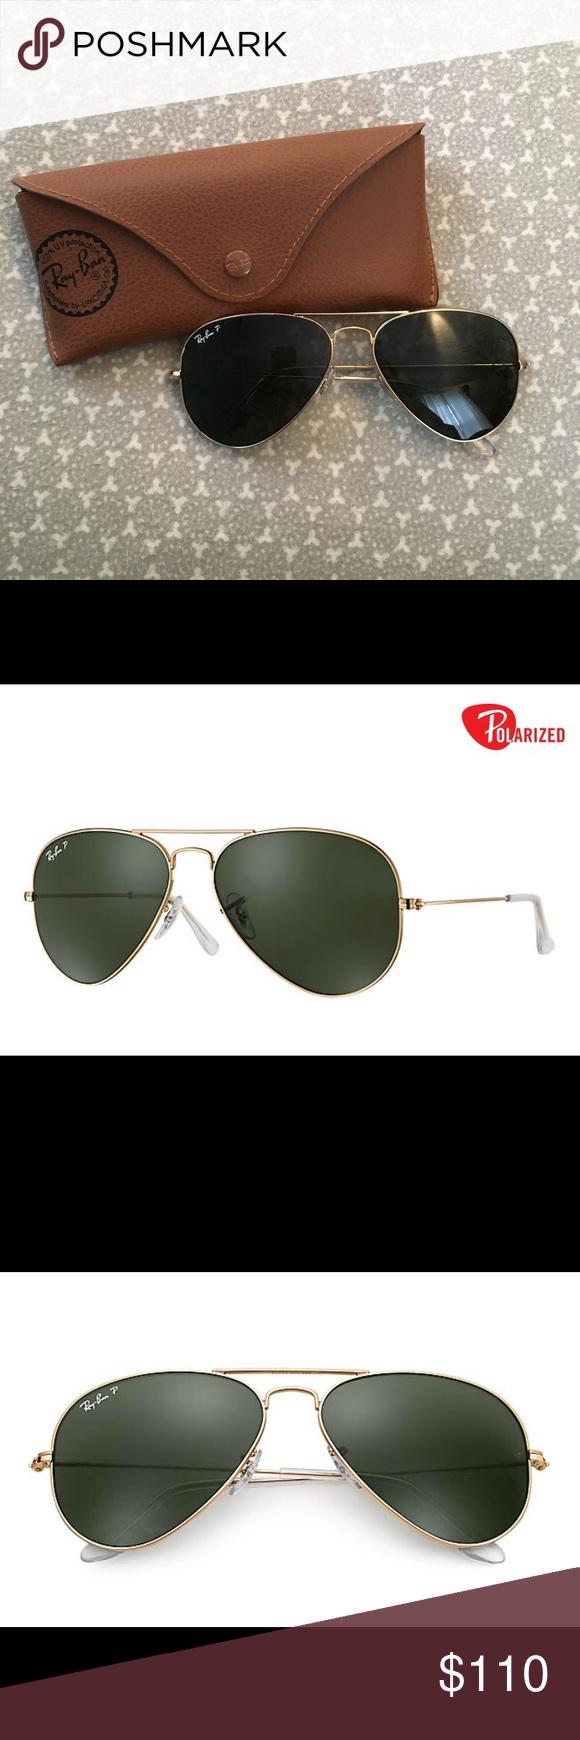 0fa3b23140 Ray-Ban Aviator Gold Frame Polarized Green Lens Never used Ray-Ban classic  polarized